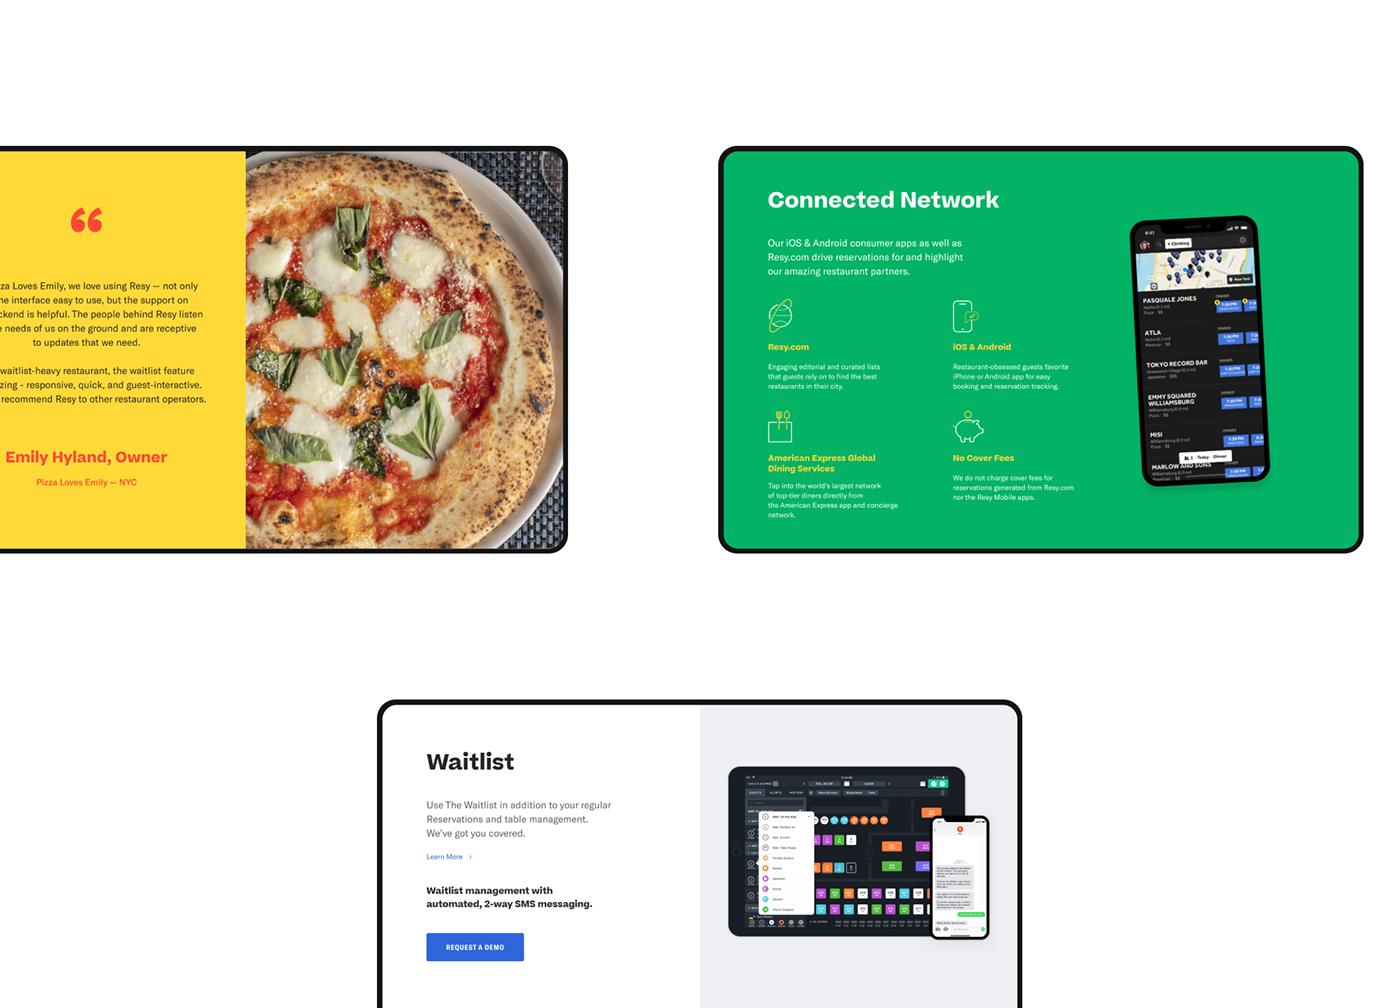 Image may contain: screenshot, fast food and abstract